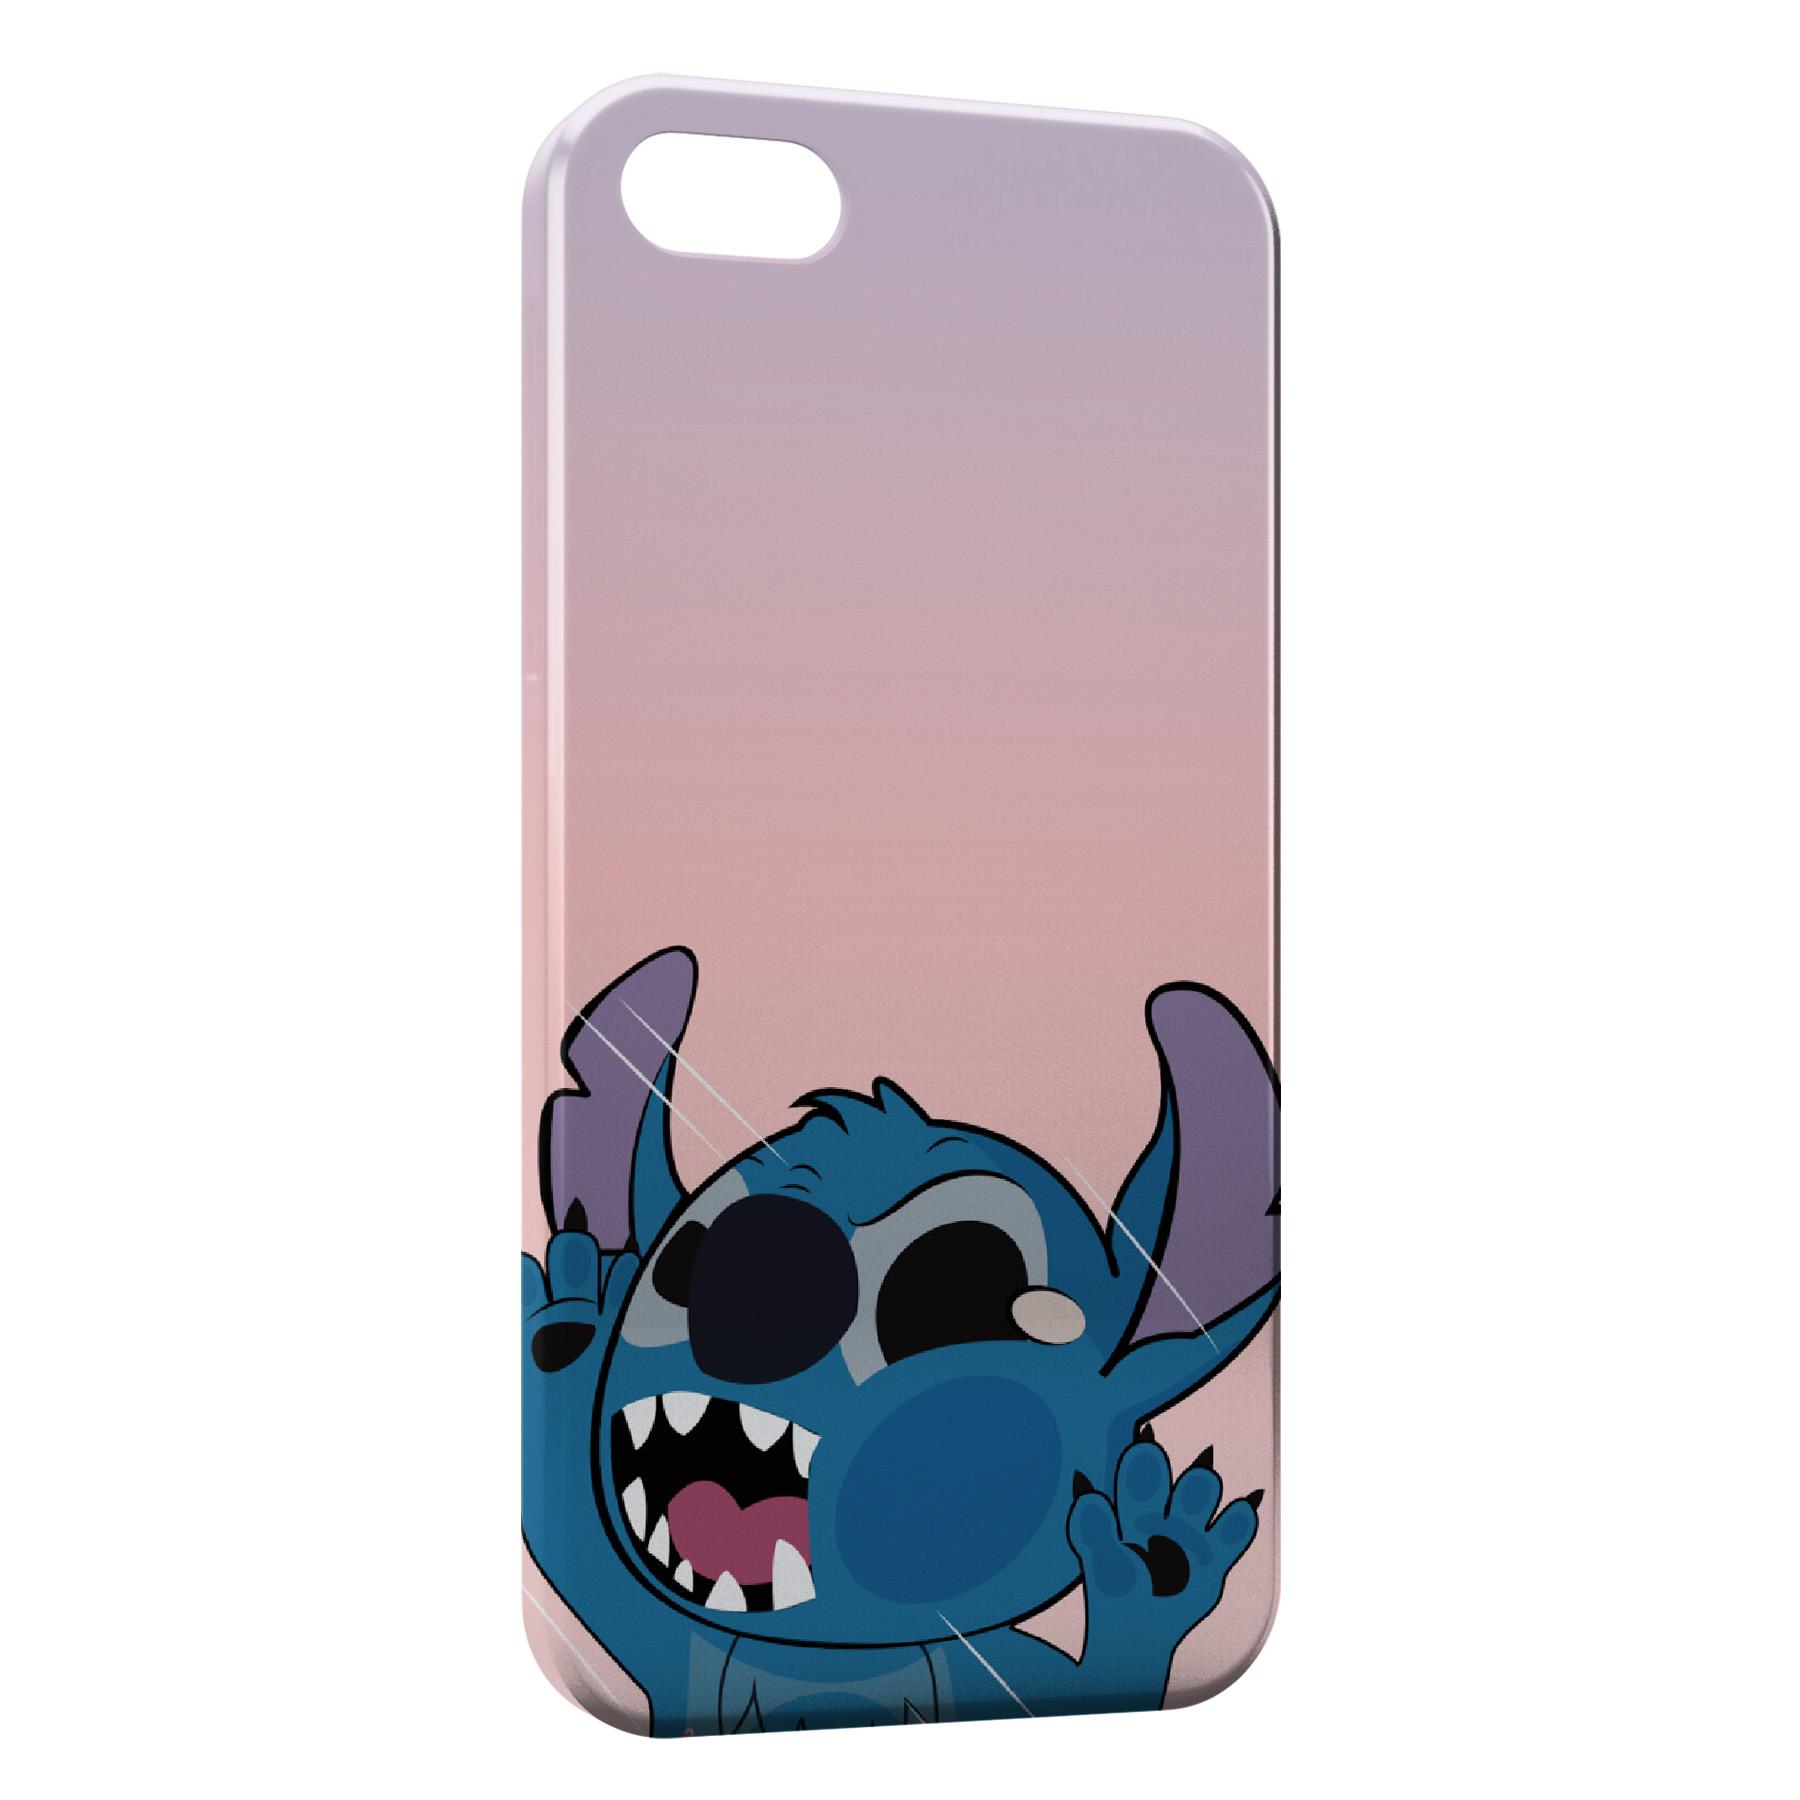 Coque iPhone 4 & 4S Stitch 16